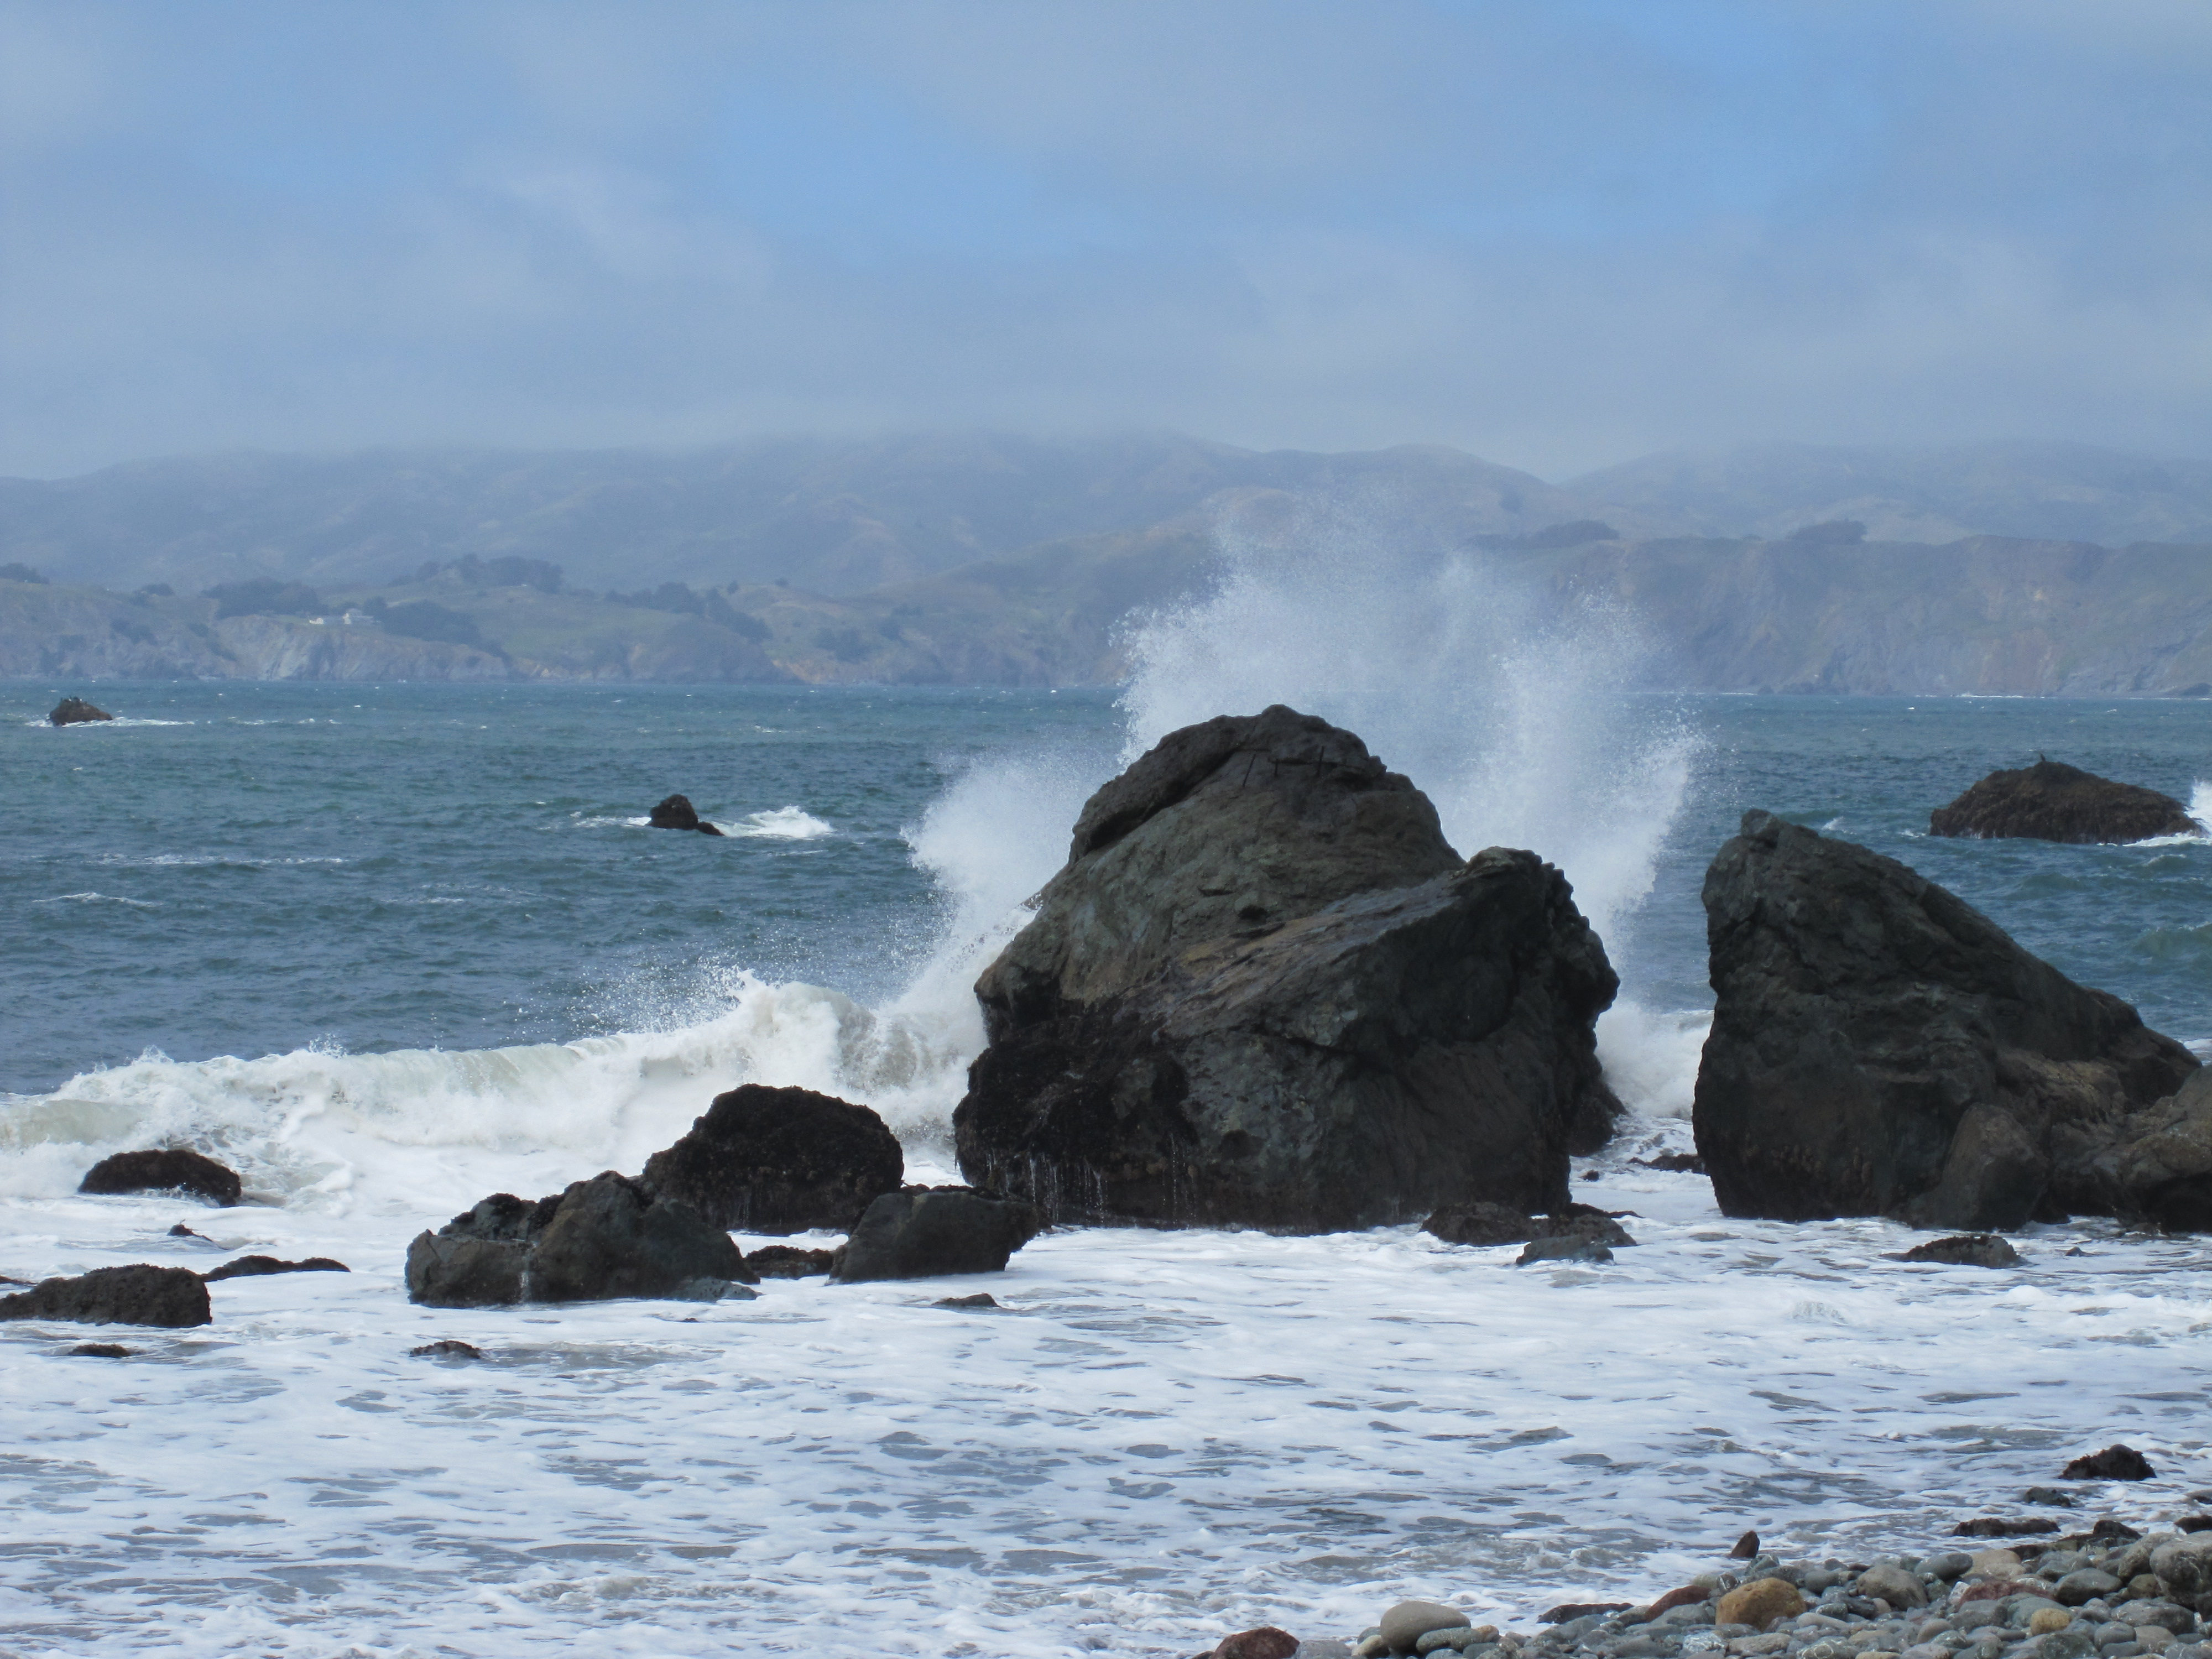 Land's End waves crashing on the beach